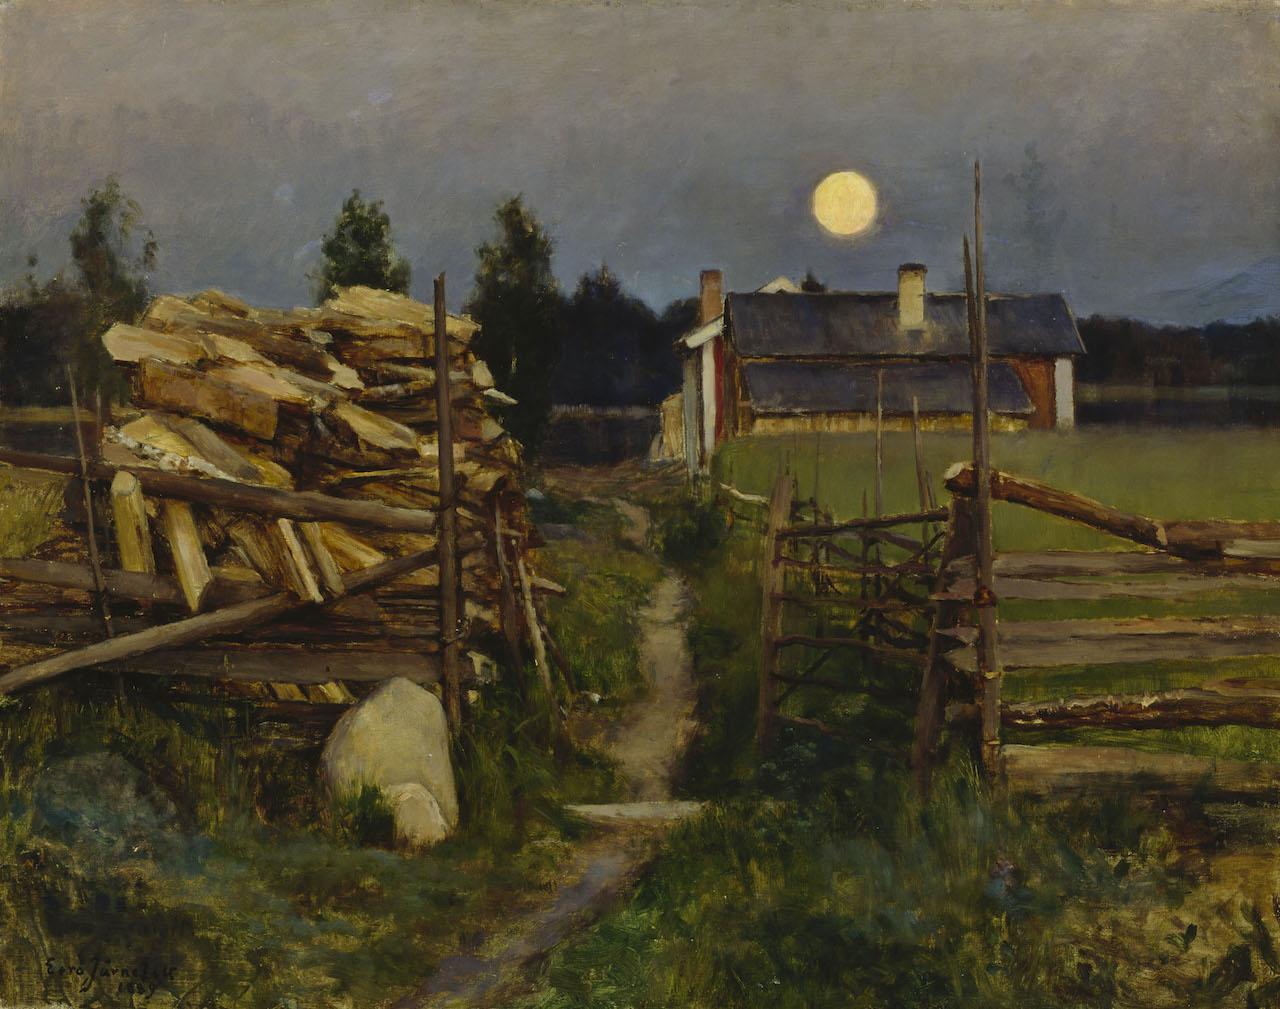 Eero Järnefelt: Summer night moon. 1889. Öl / Leinwand.62 x 79,5cm